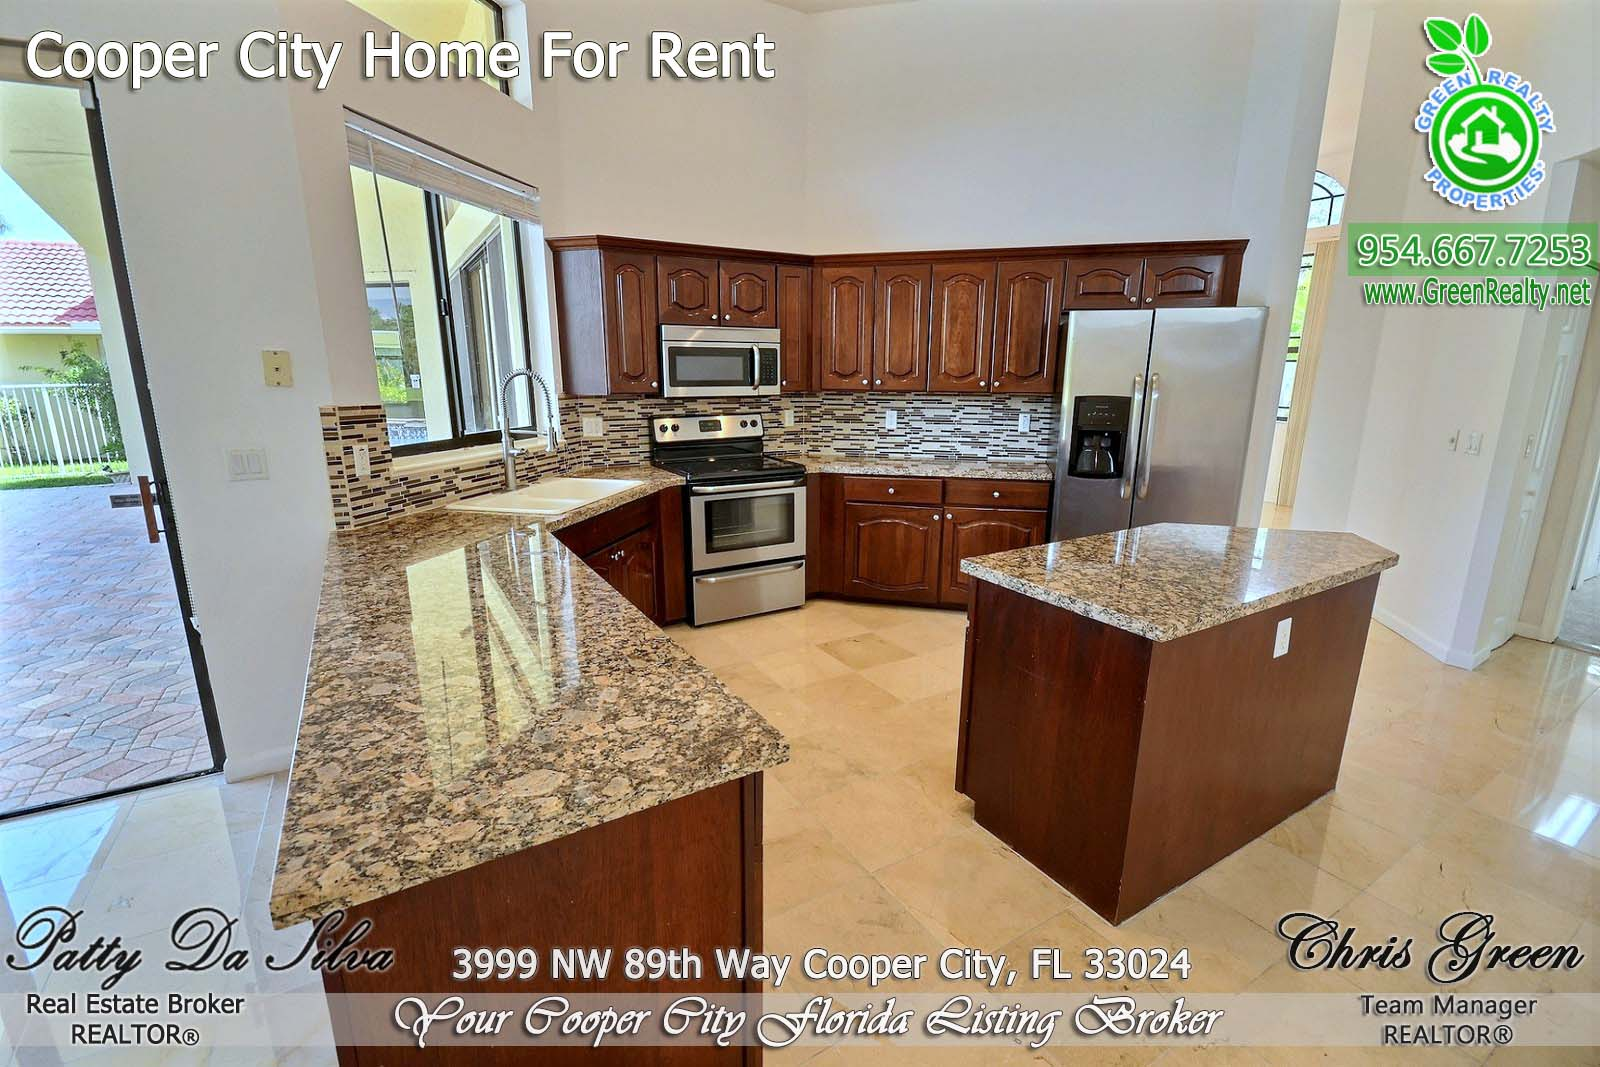 20 Cooper City Home Rentals (5)